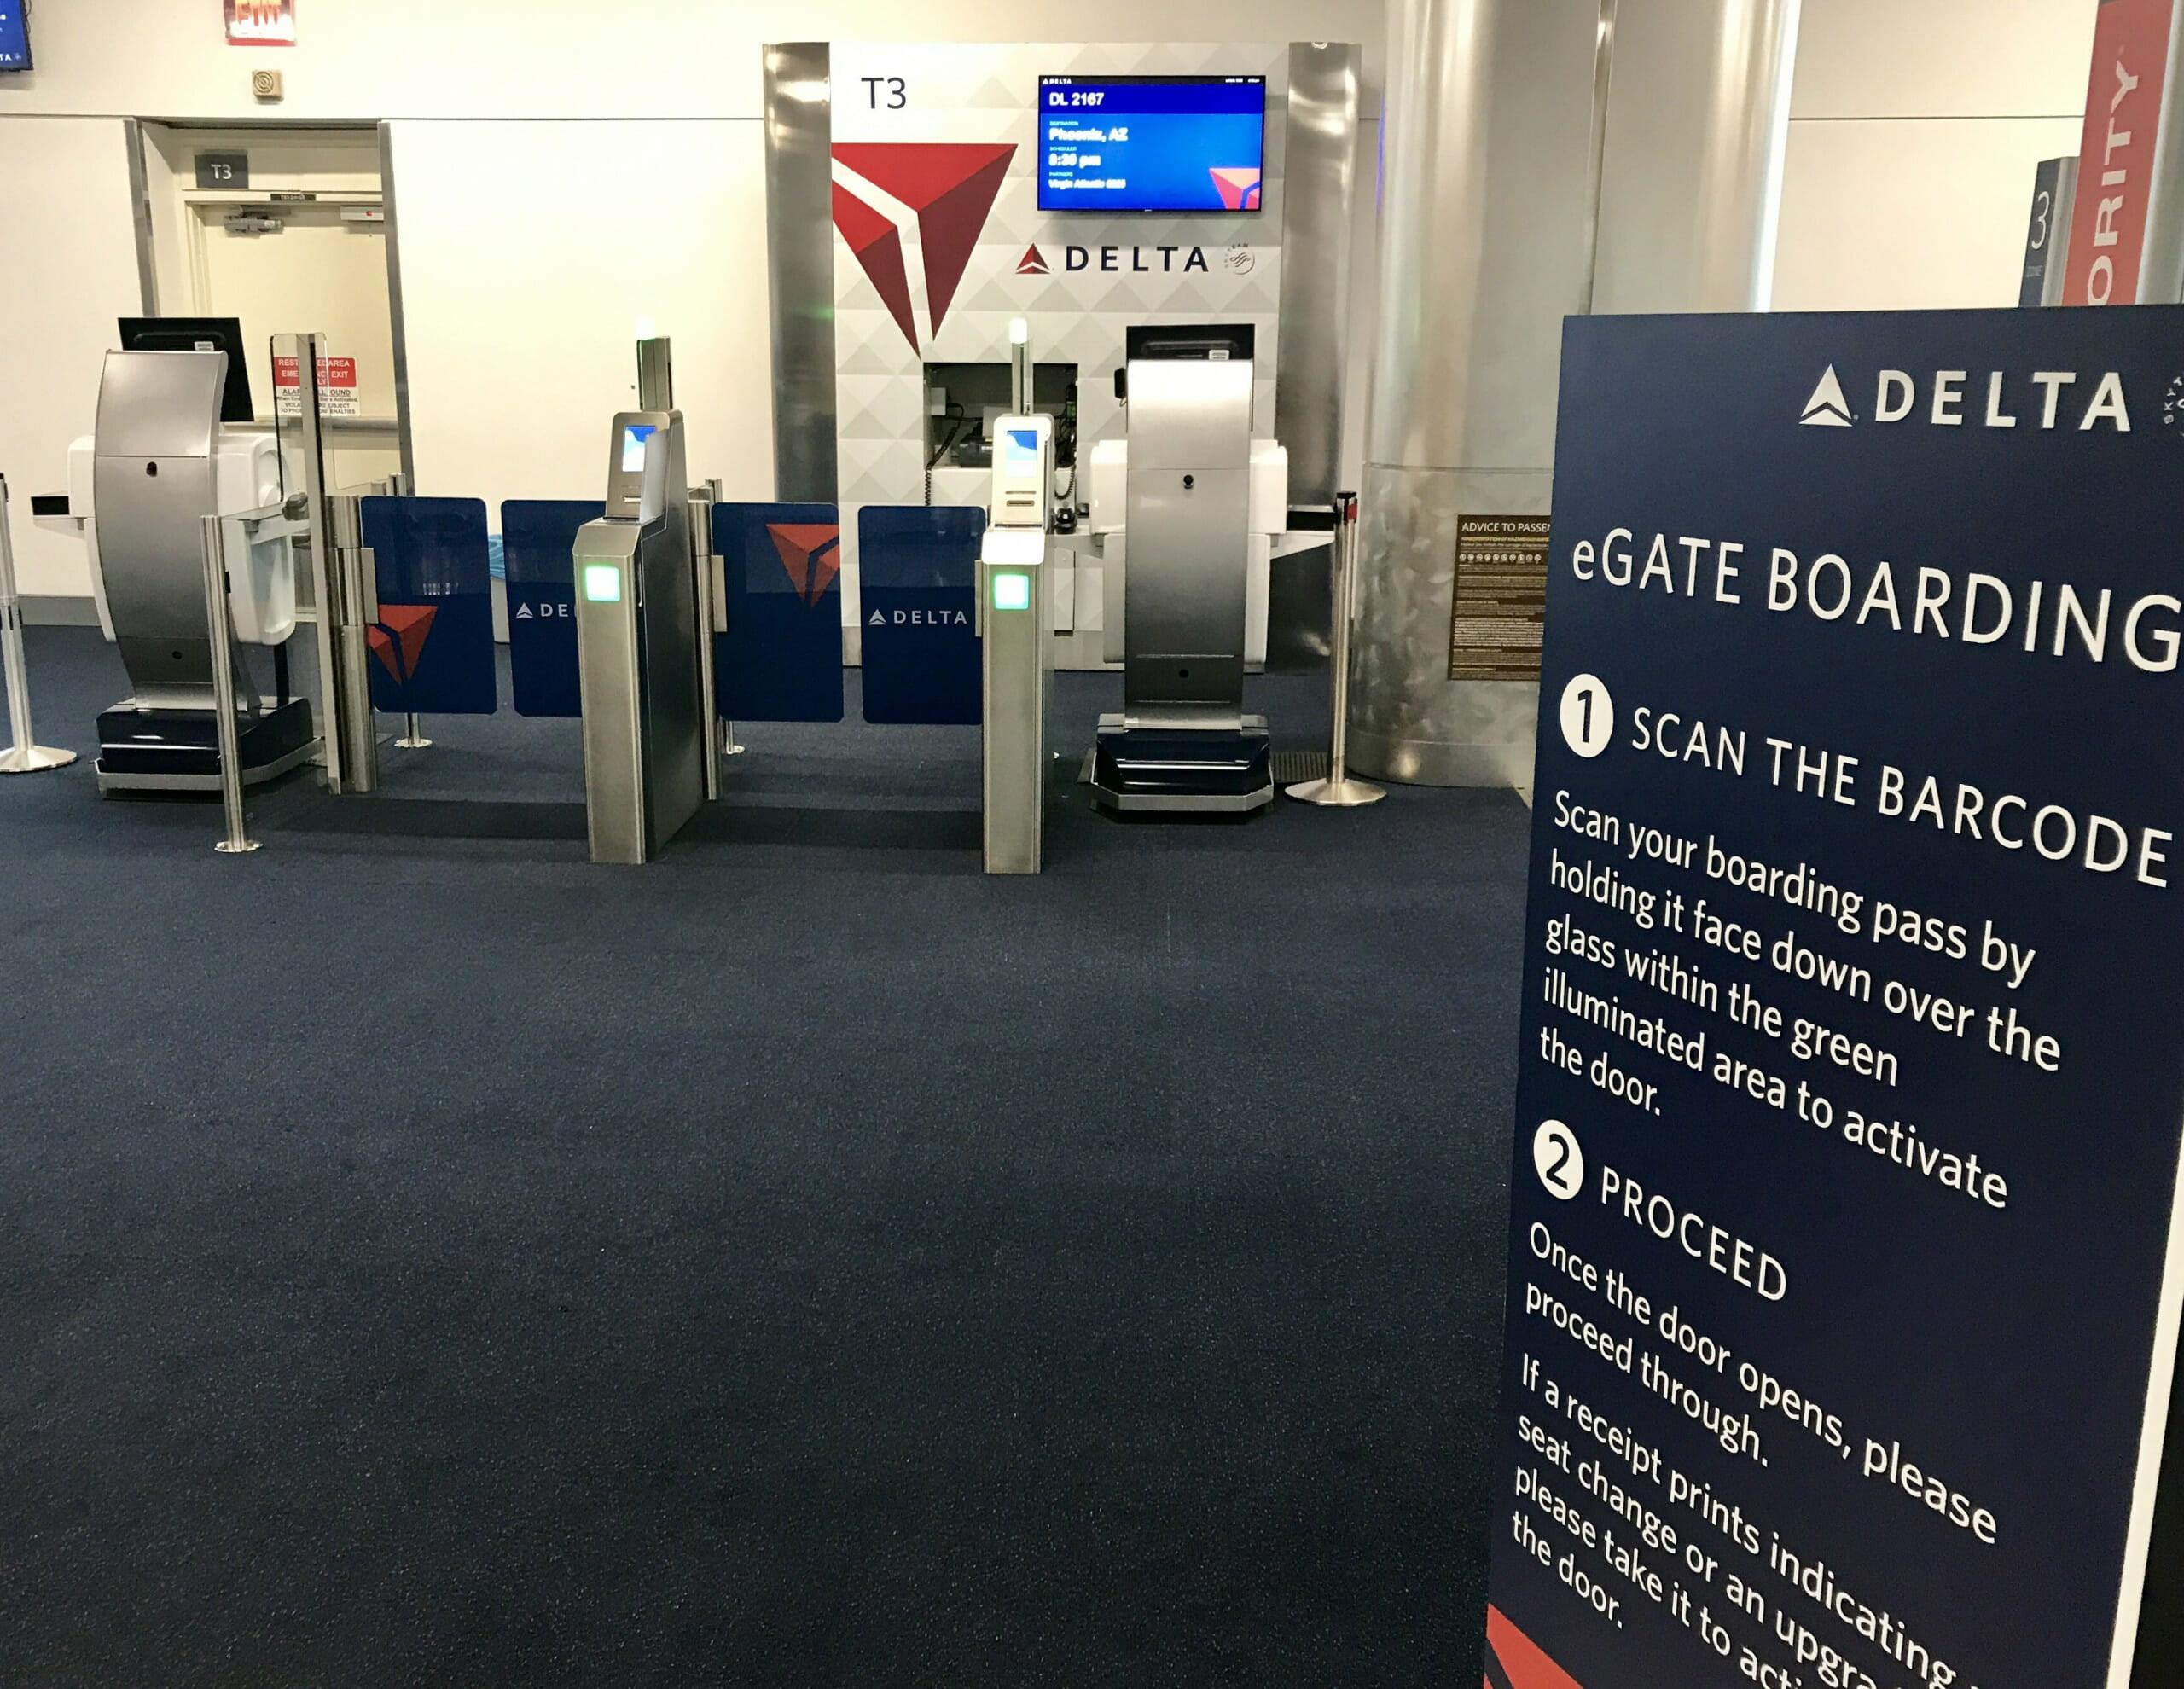 Delta eGate boarding in ATL